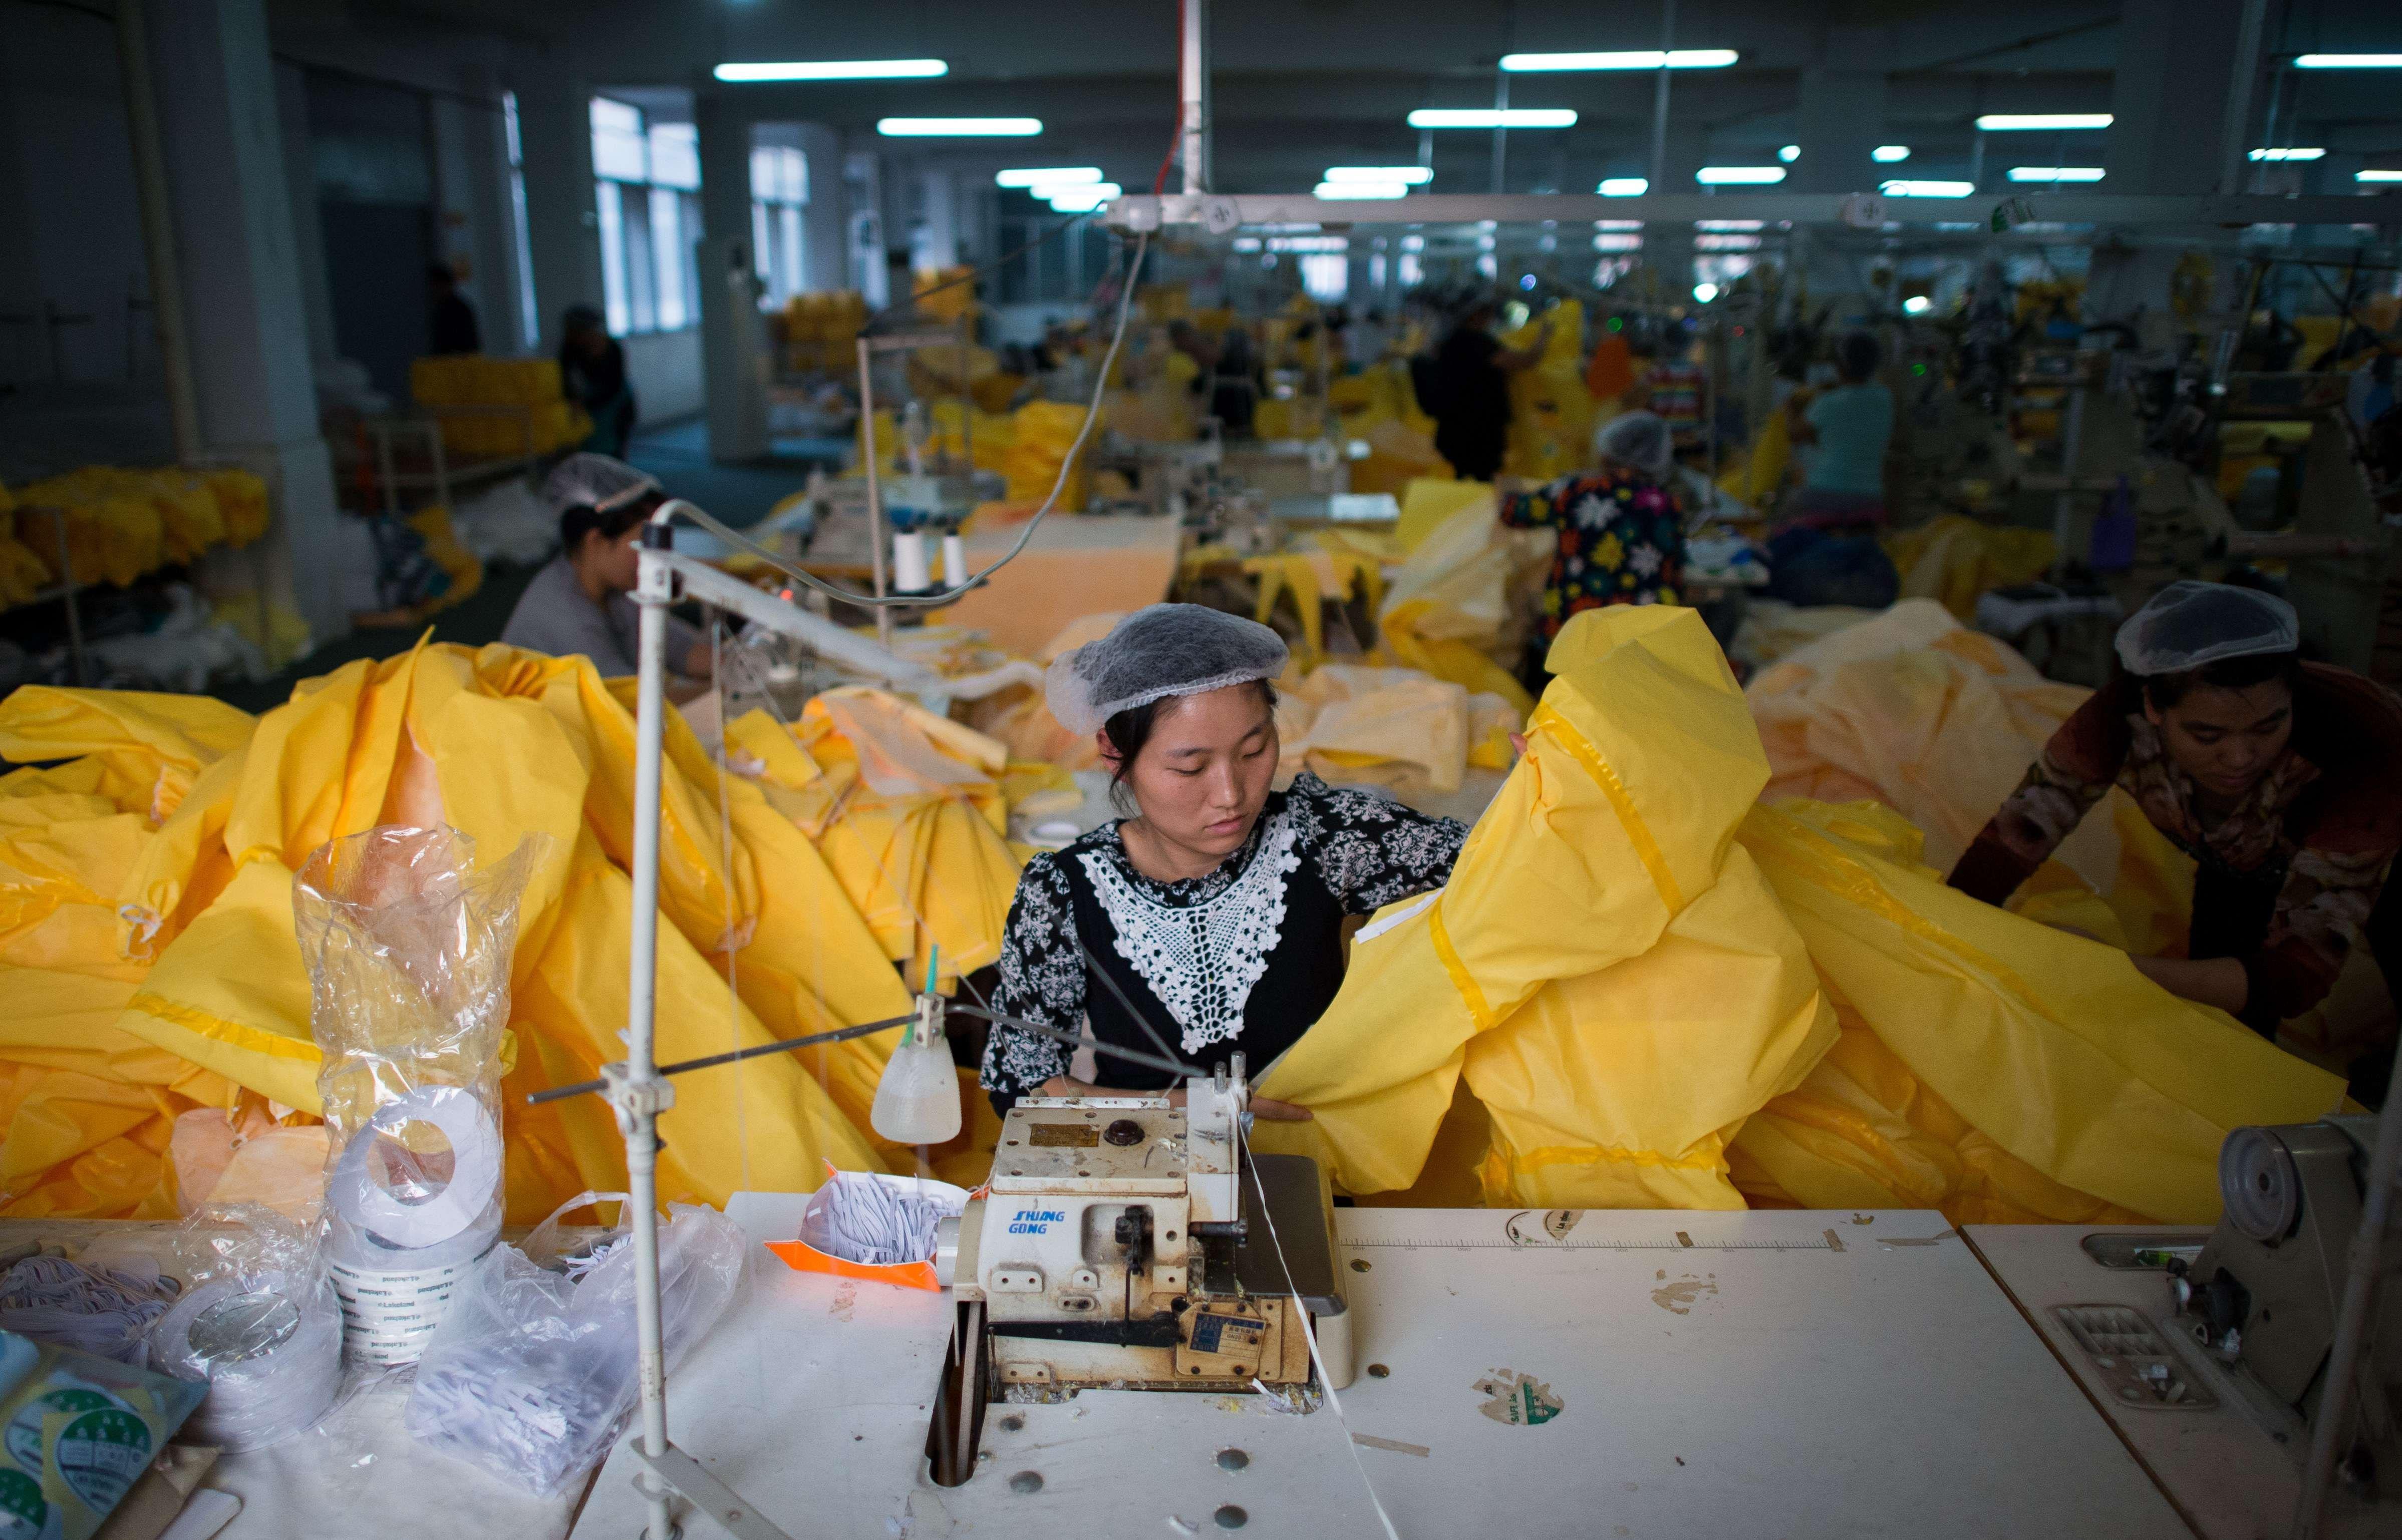 http://media1.s-nbcnews.com/i/newscms/2014_43/733011/pc-141024-ebola-suit-china-02_b3b3d56d521df5fd74db4a64b0b59246.JPG